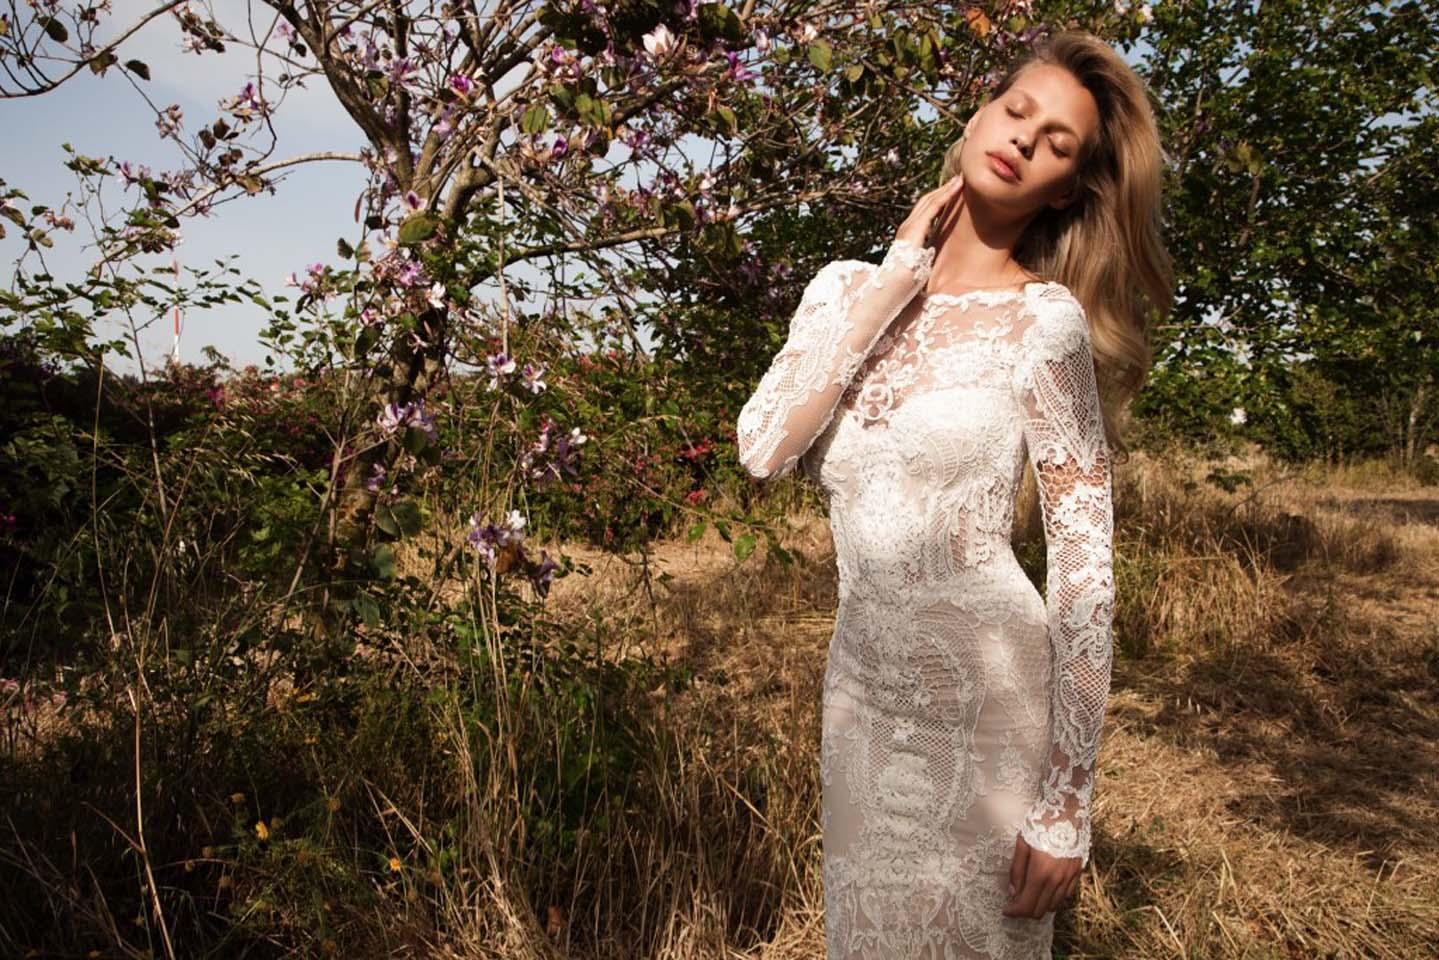 GaliaLahav-bridal-collection-spring-summer-2017-wedding-gowns-designer-beautiful (29)-sheer-gown